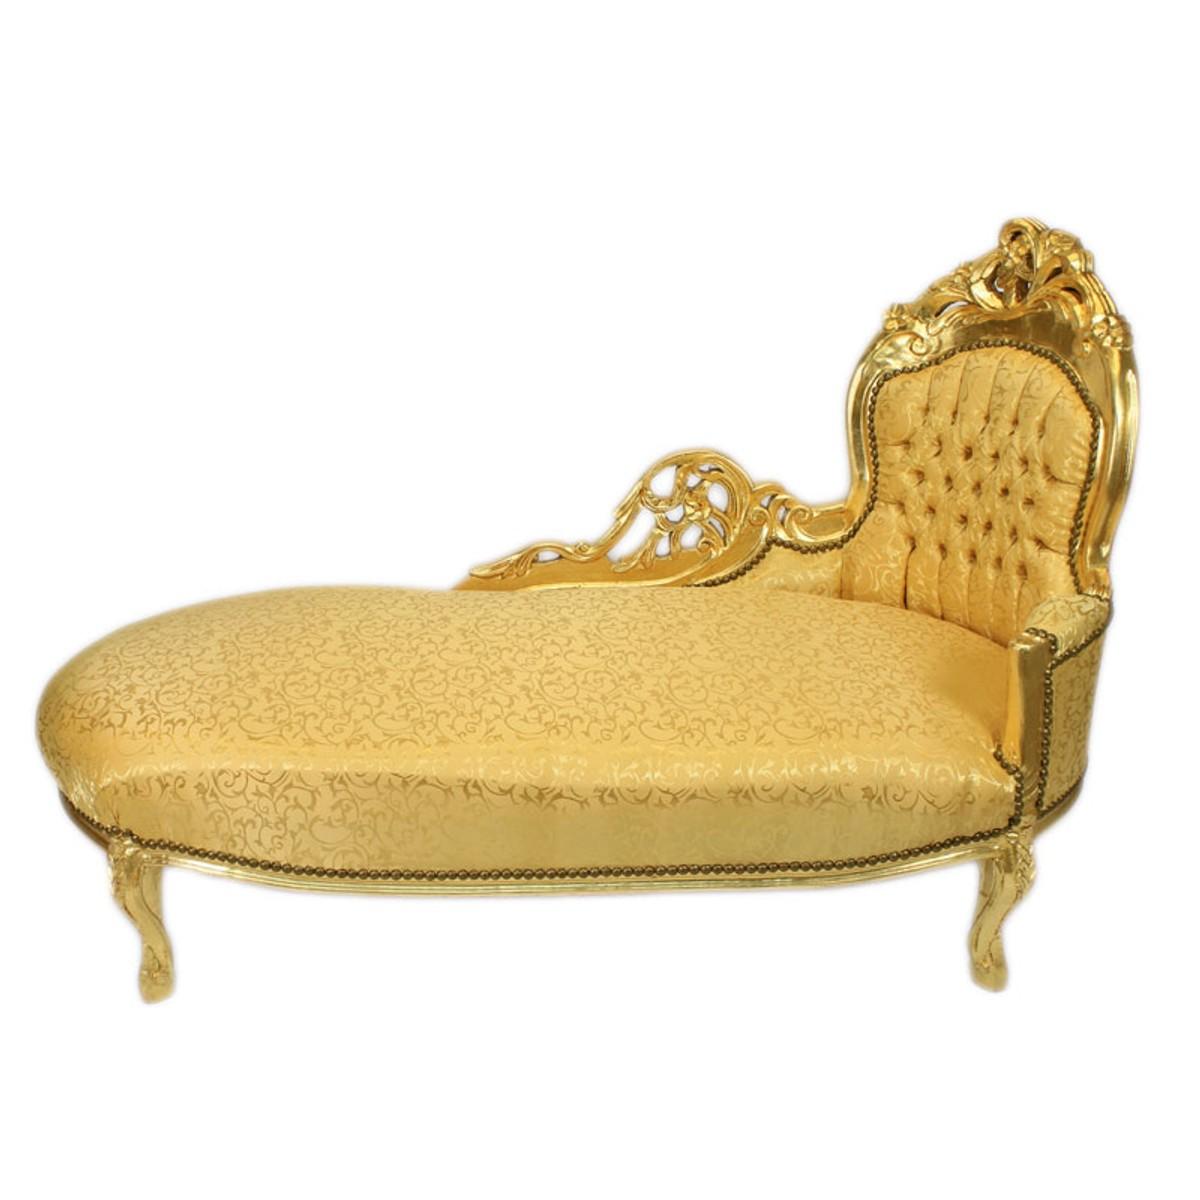 Full Size of Recamiere Barock Rot Diplomatie Chaiselongue Boudoir Casa Padrino Gold Muster Mbel Bett Sofa Mit Wohnzimmer Recamiere Barock